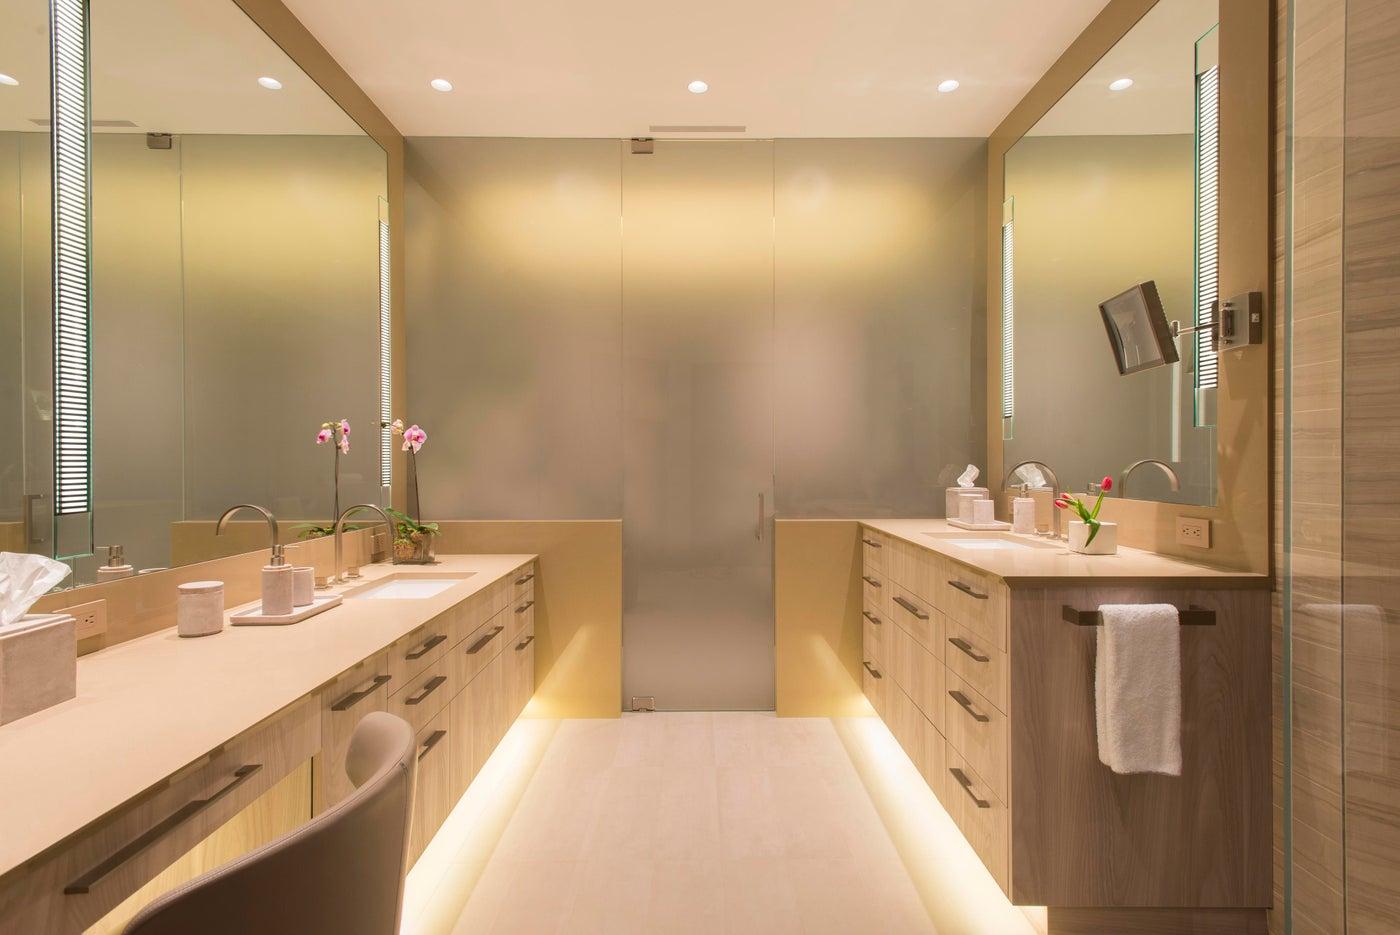 Snowmass Village, Aspen Two Creeks Remodel- Master Bathroom, Lighting details